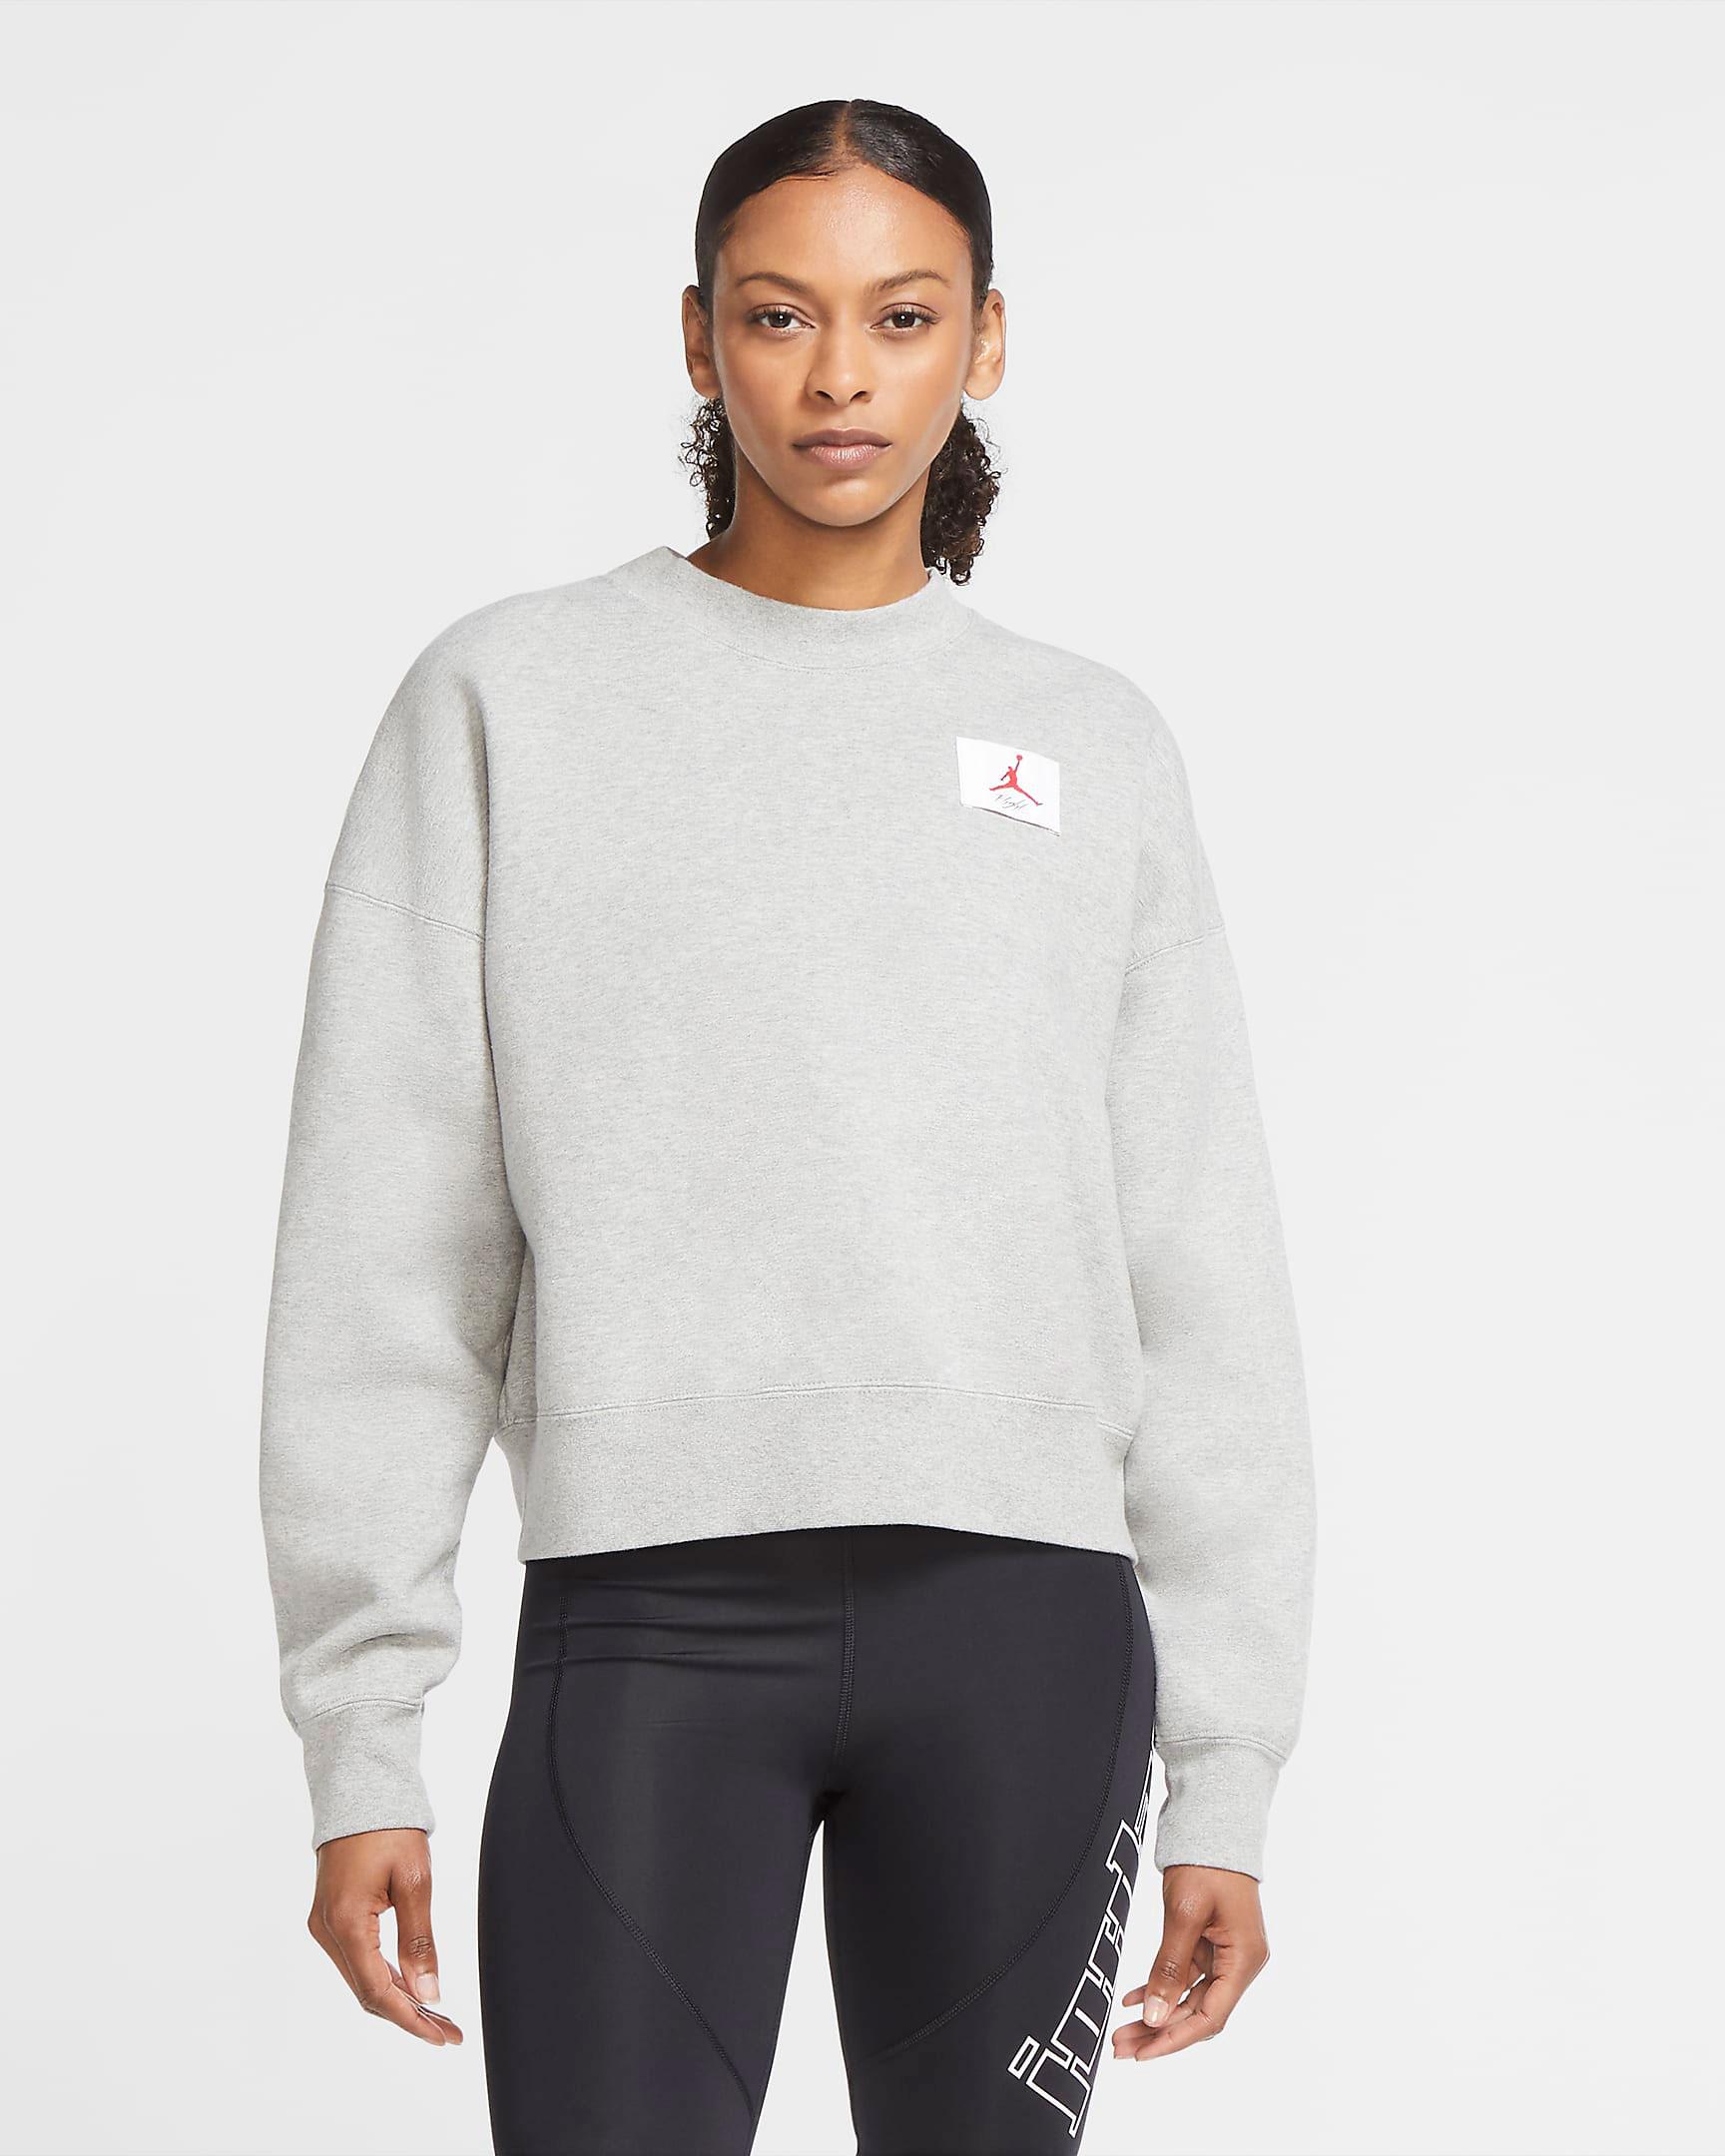 jordan-womens-flight-sweatshirt-cement-grey